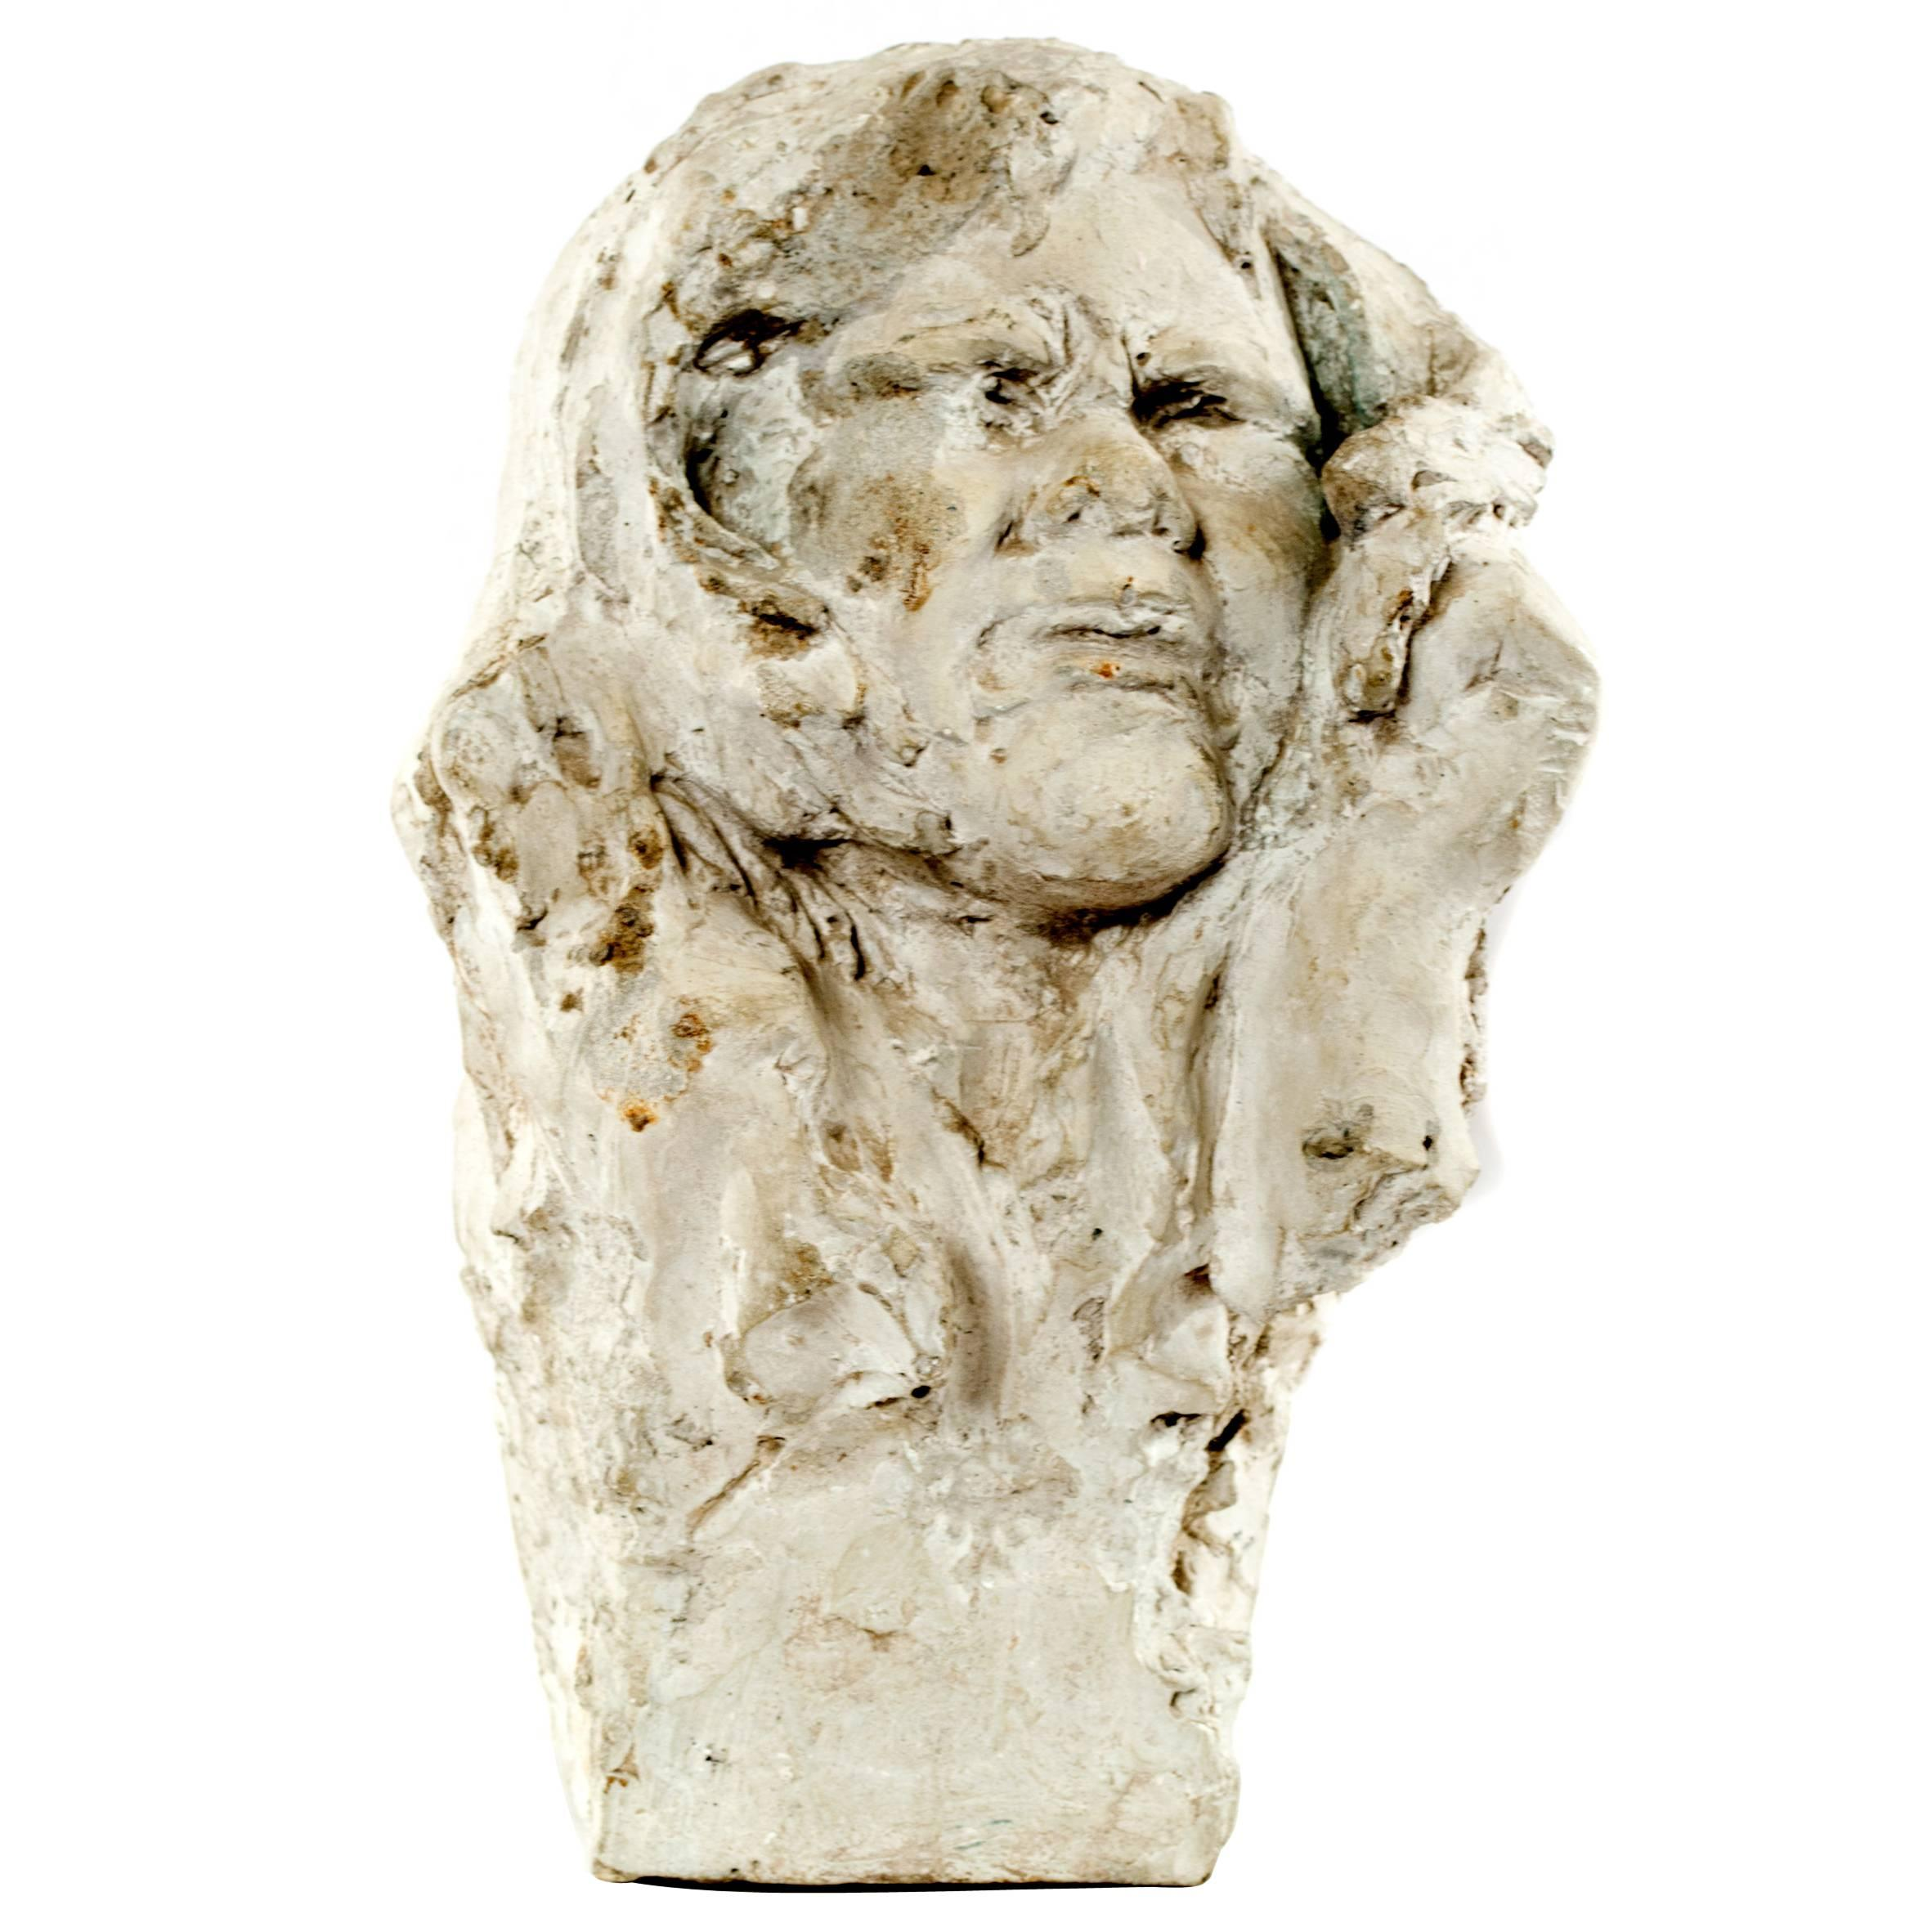 Plaster Study of a Head by Solon Borglum